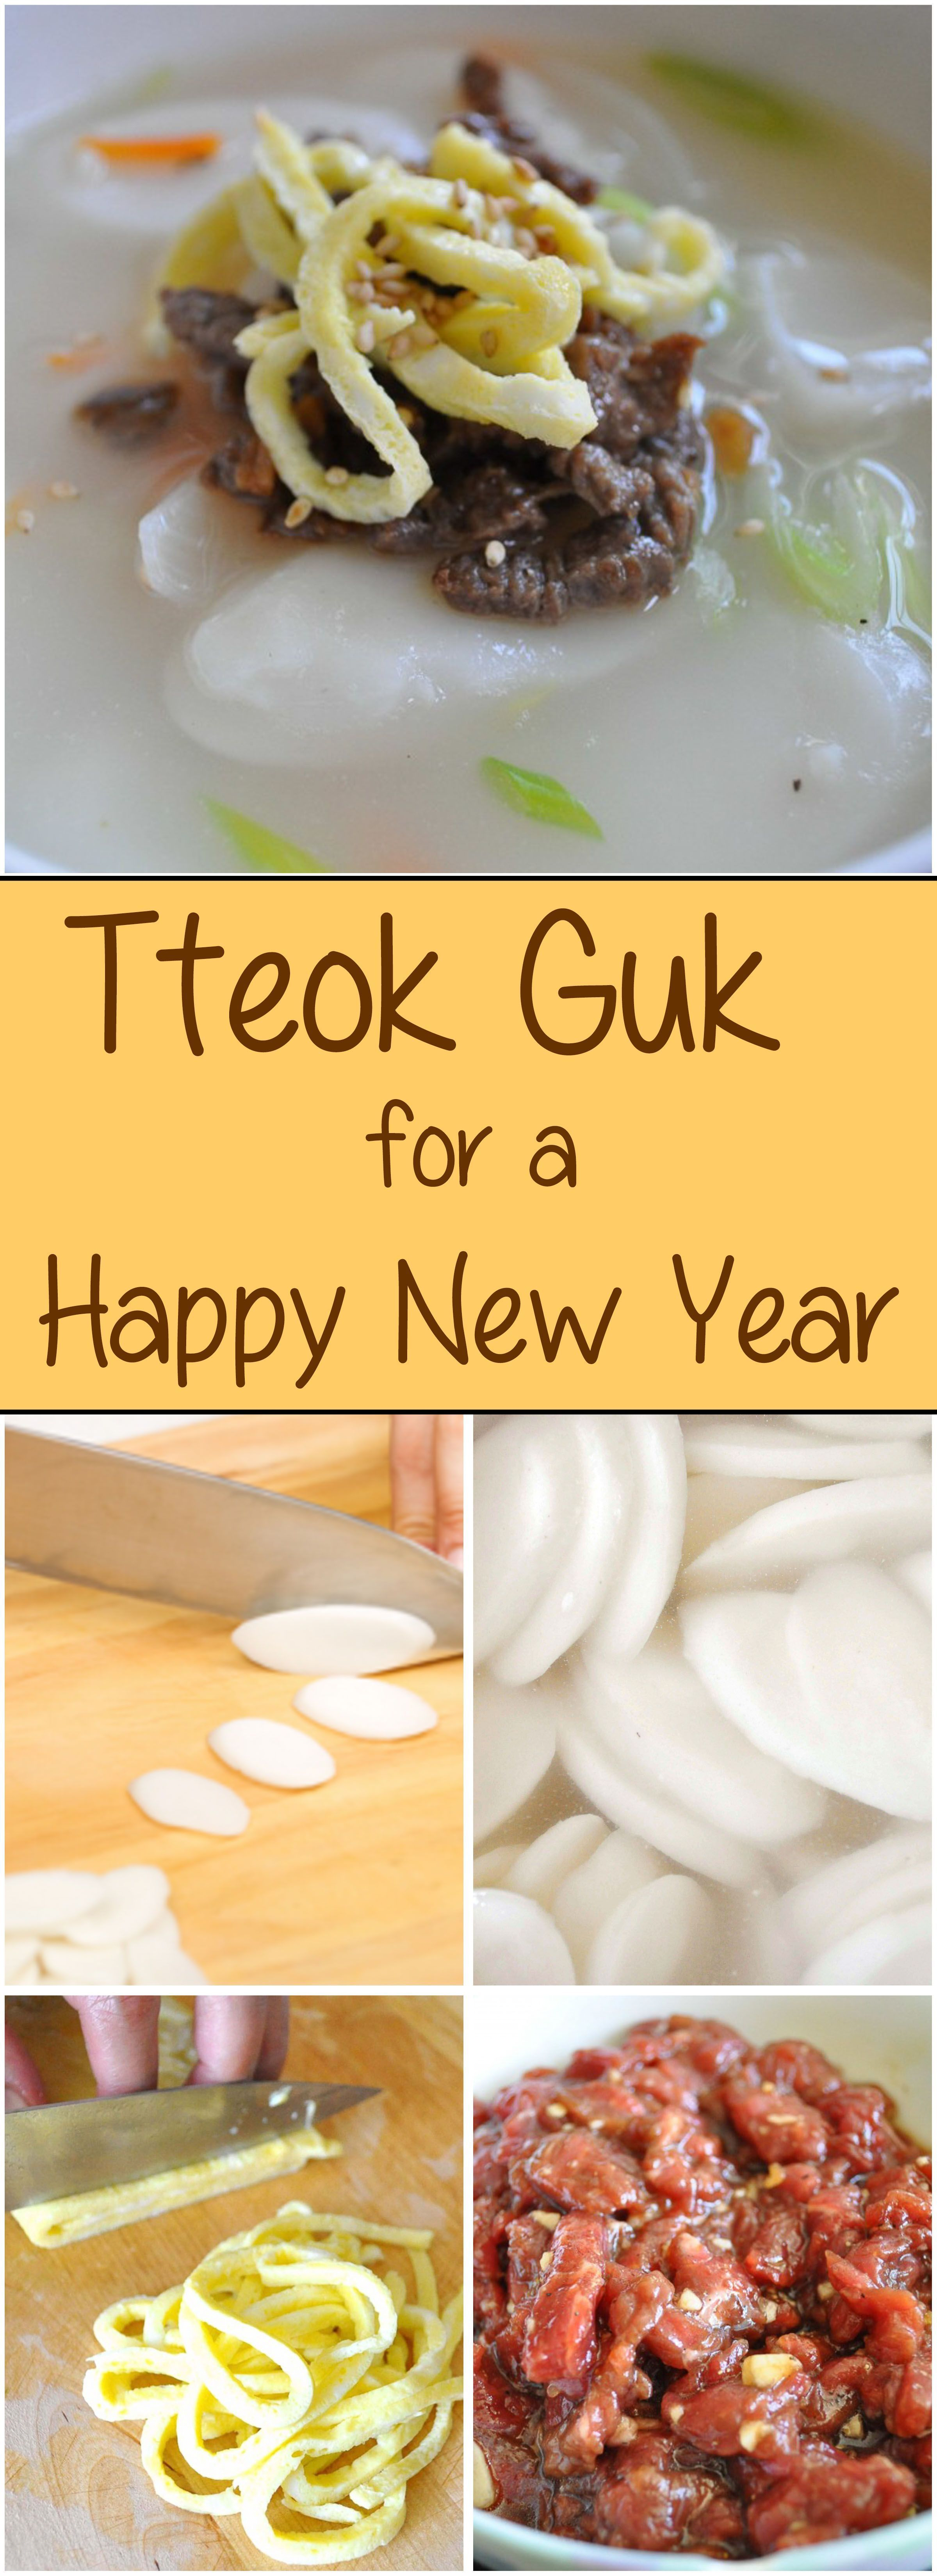 Traditionally Koreans have Tteok Guk (뗙국) - Rice Cake Soup ...